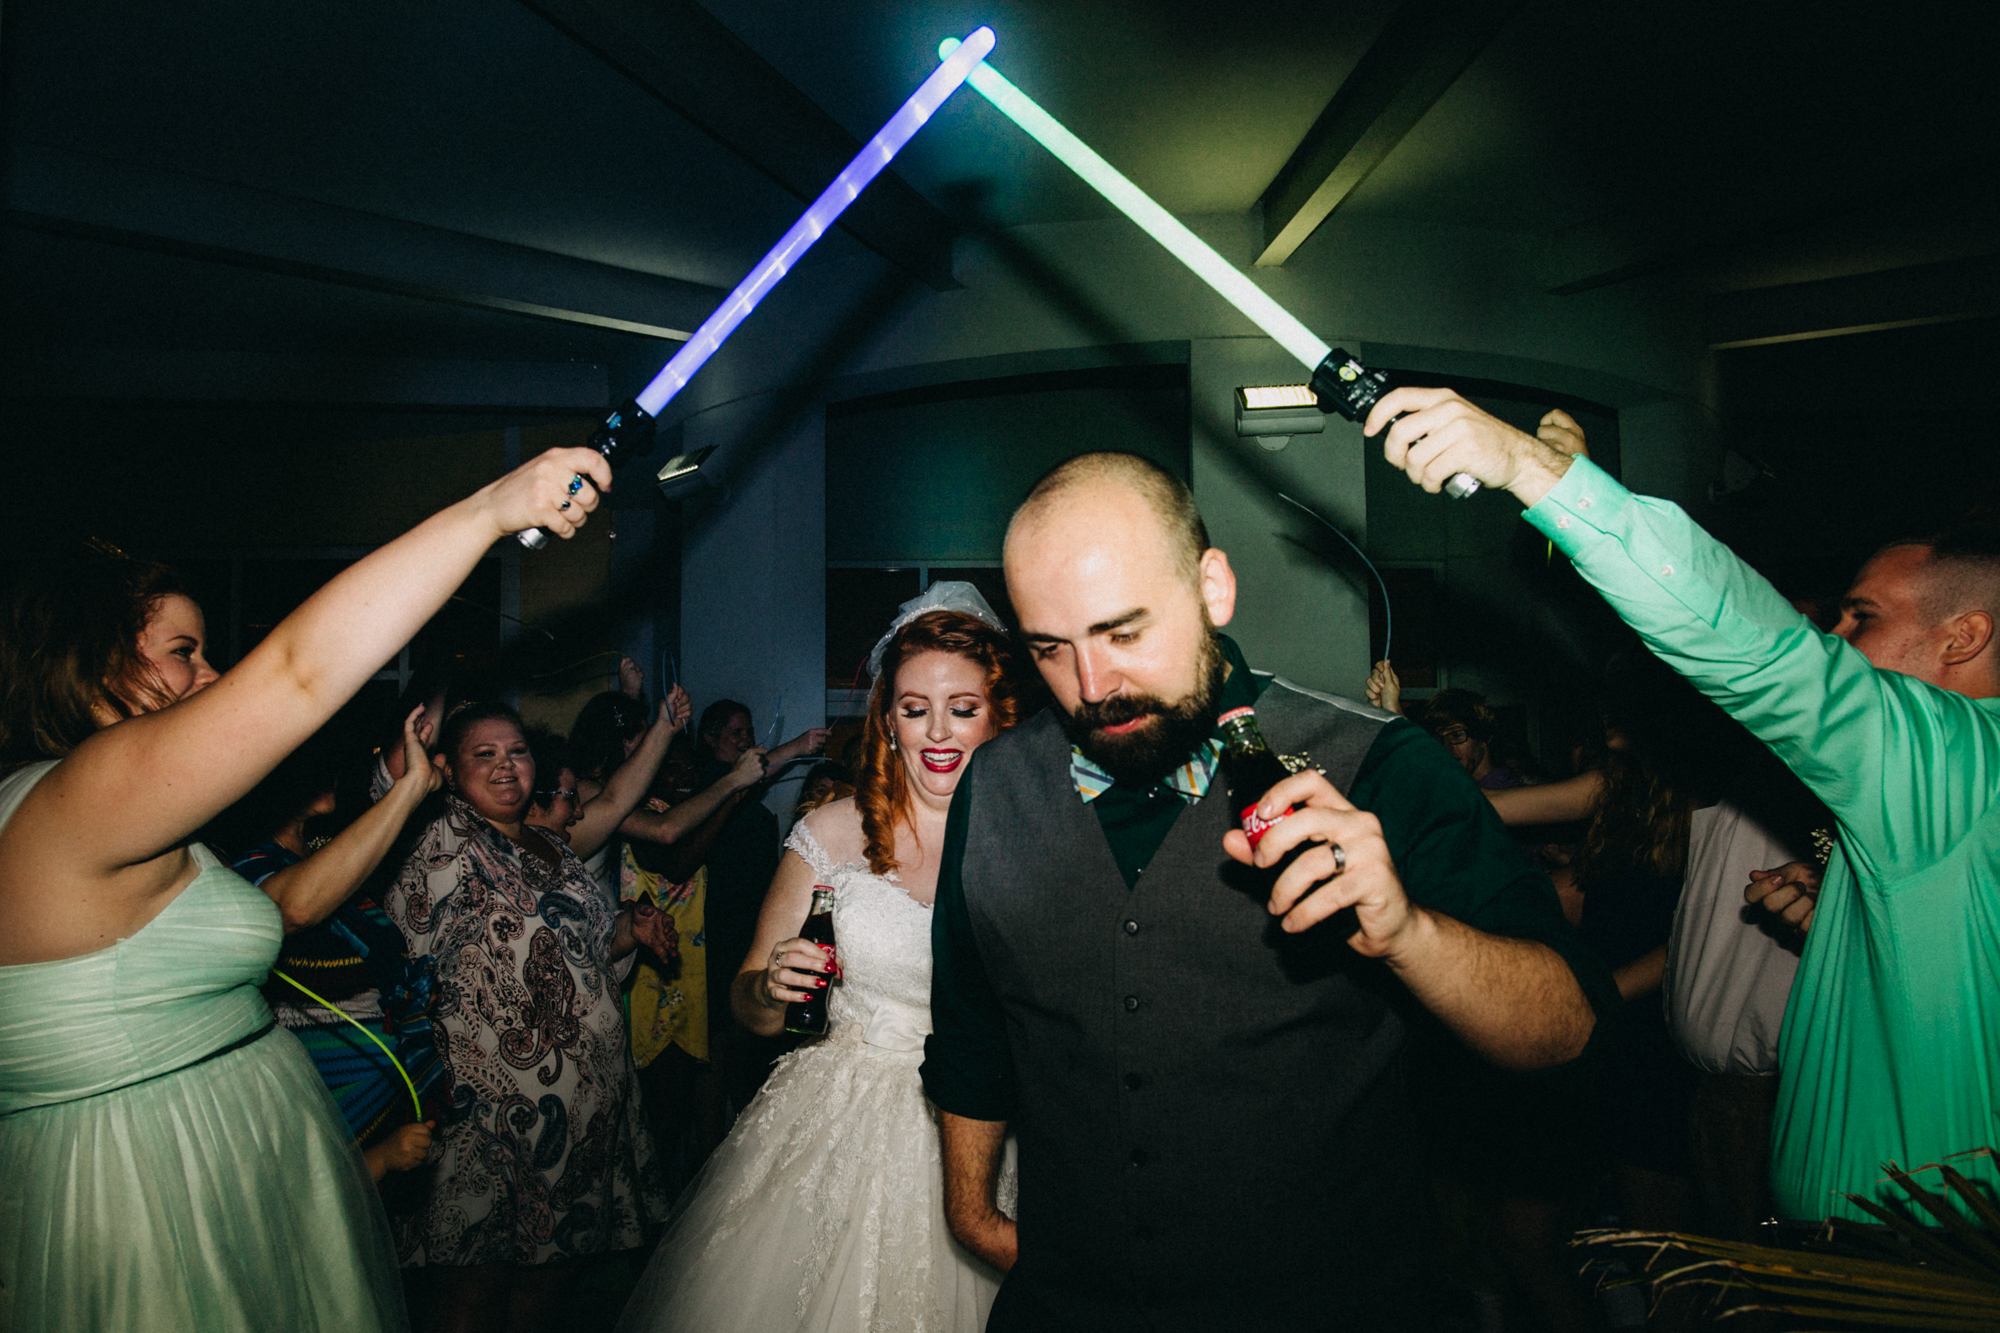 Star Wars wedding exit